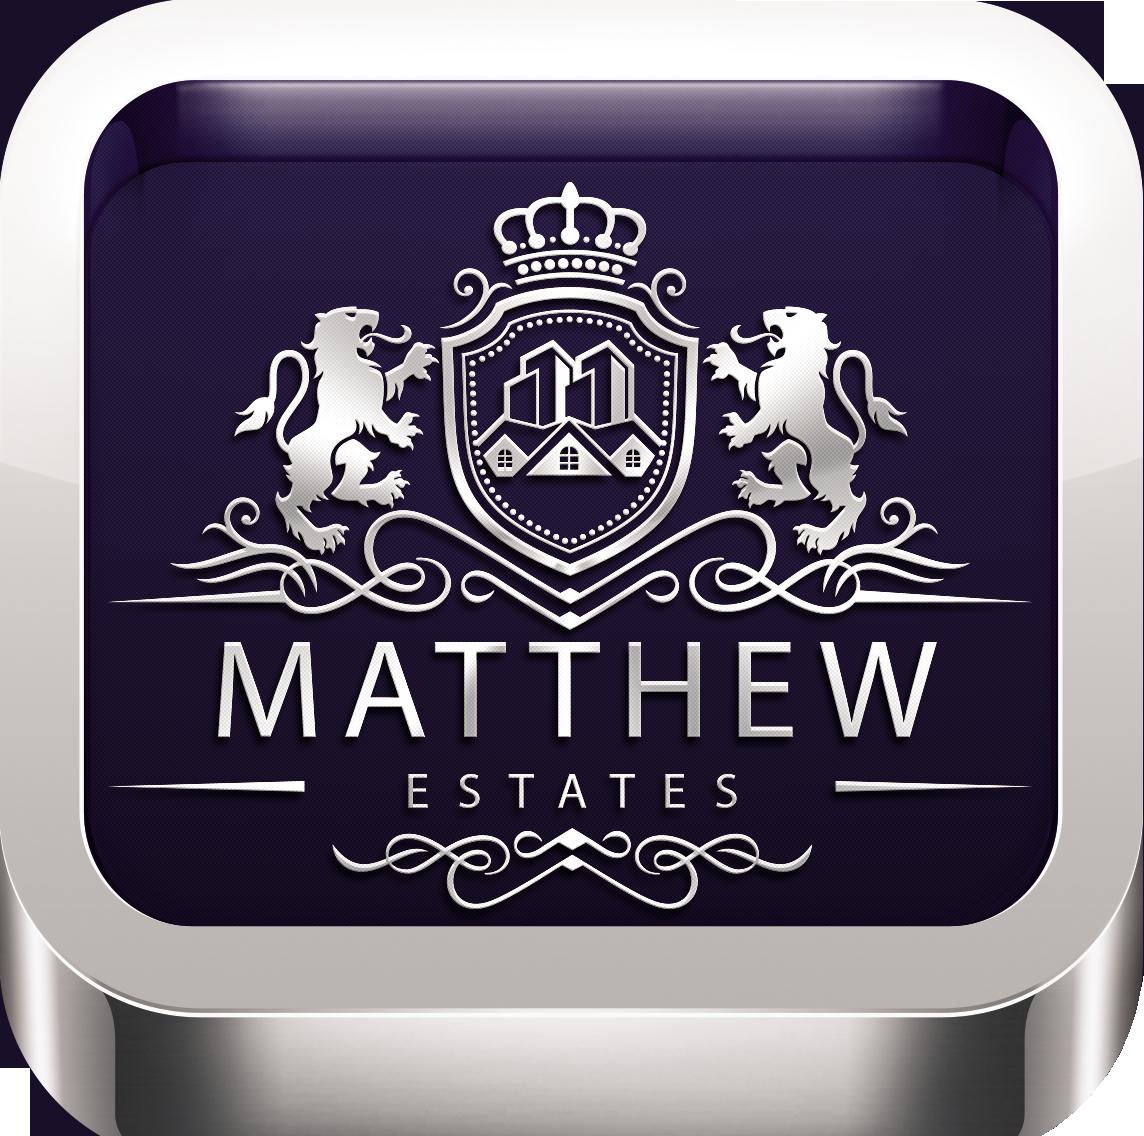 Matthew Estates Limited